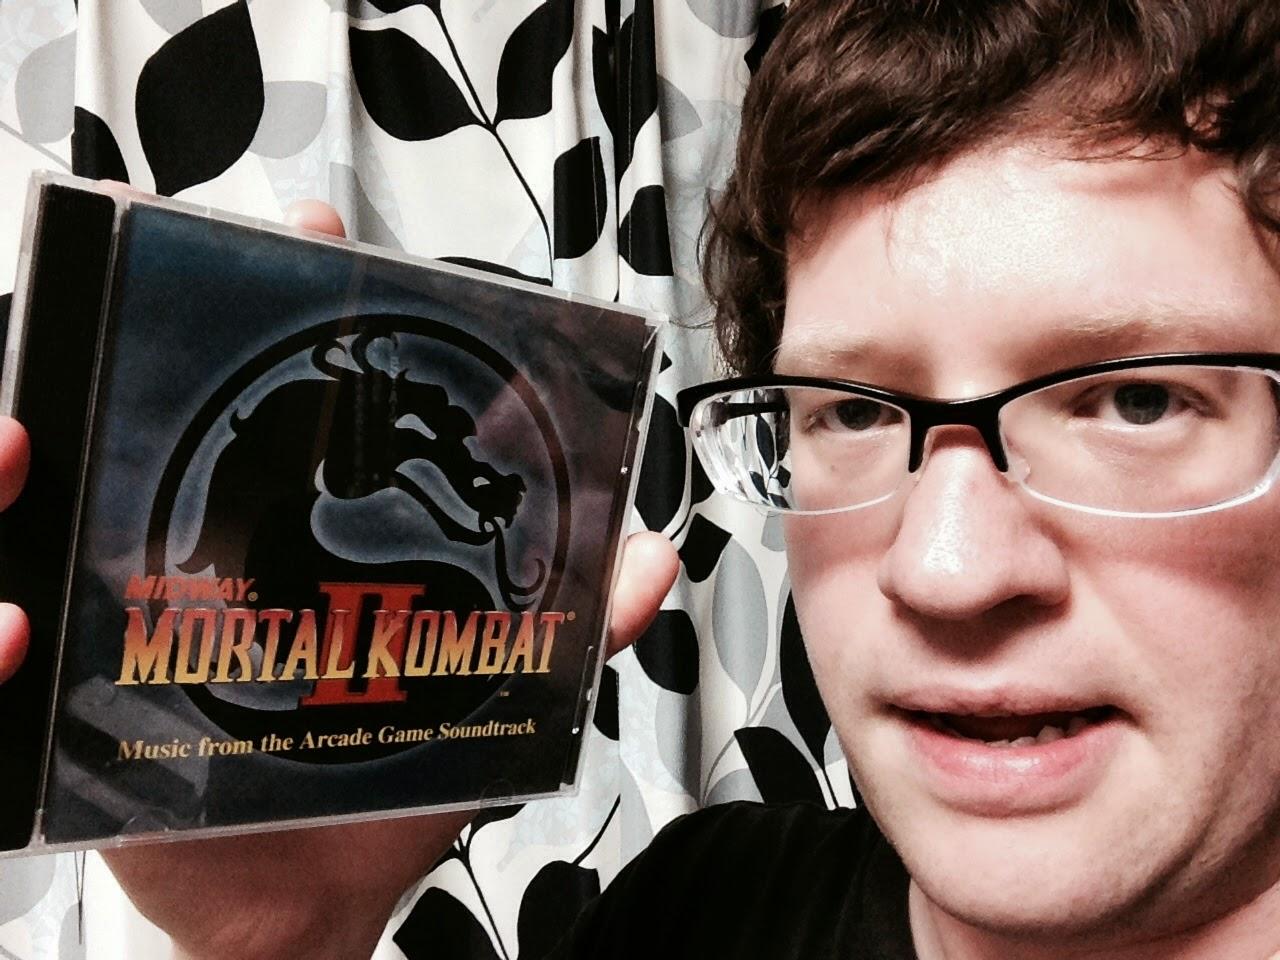 Chorus, Isolate, Confirm: Soundtrack September: Mortal Kombat